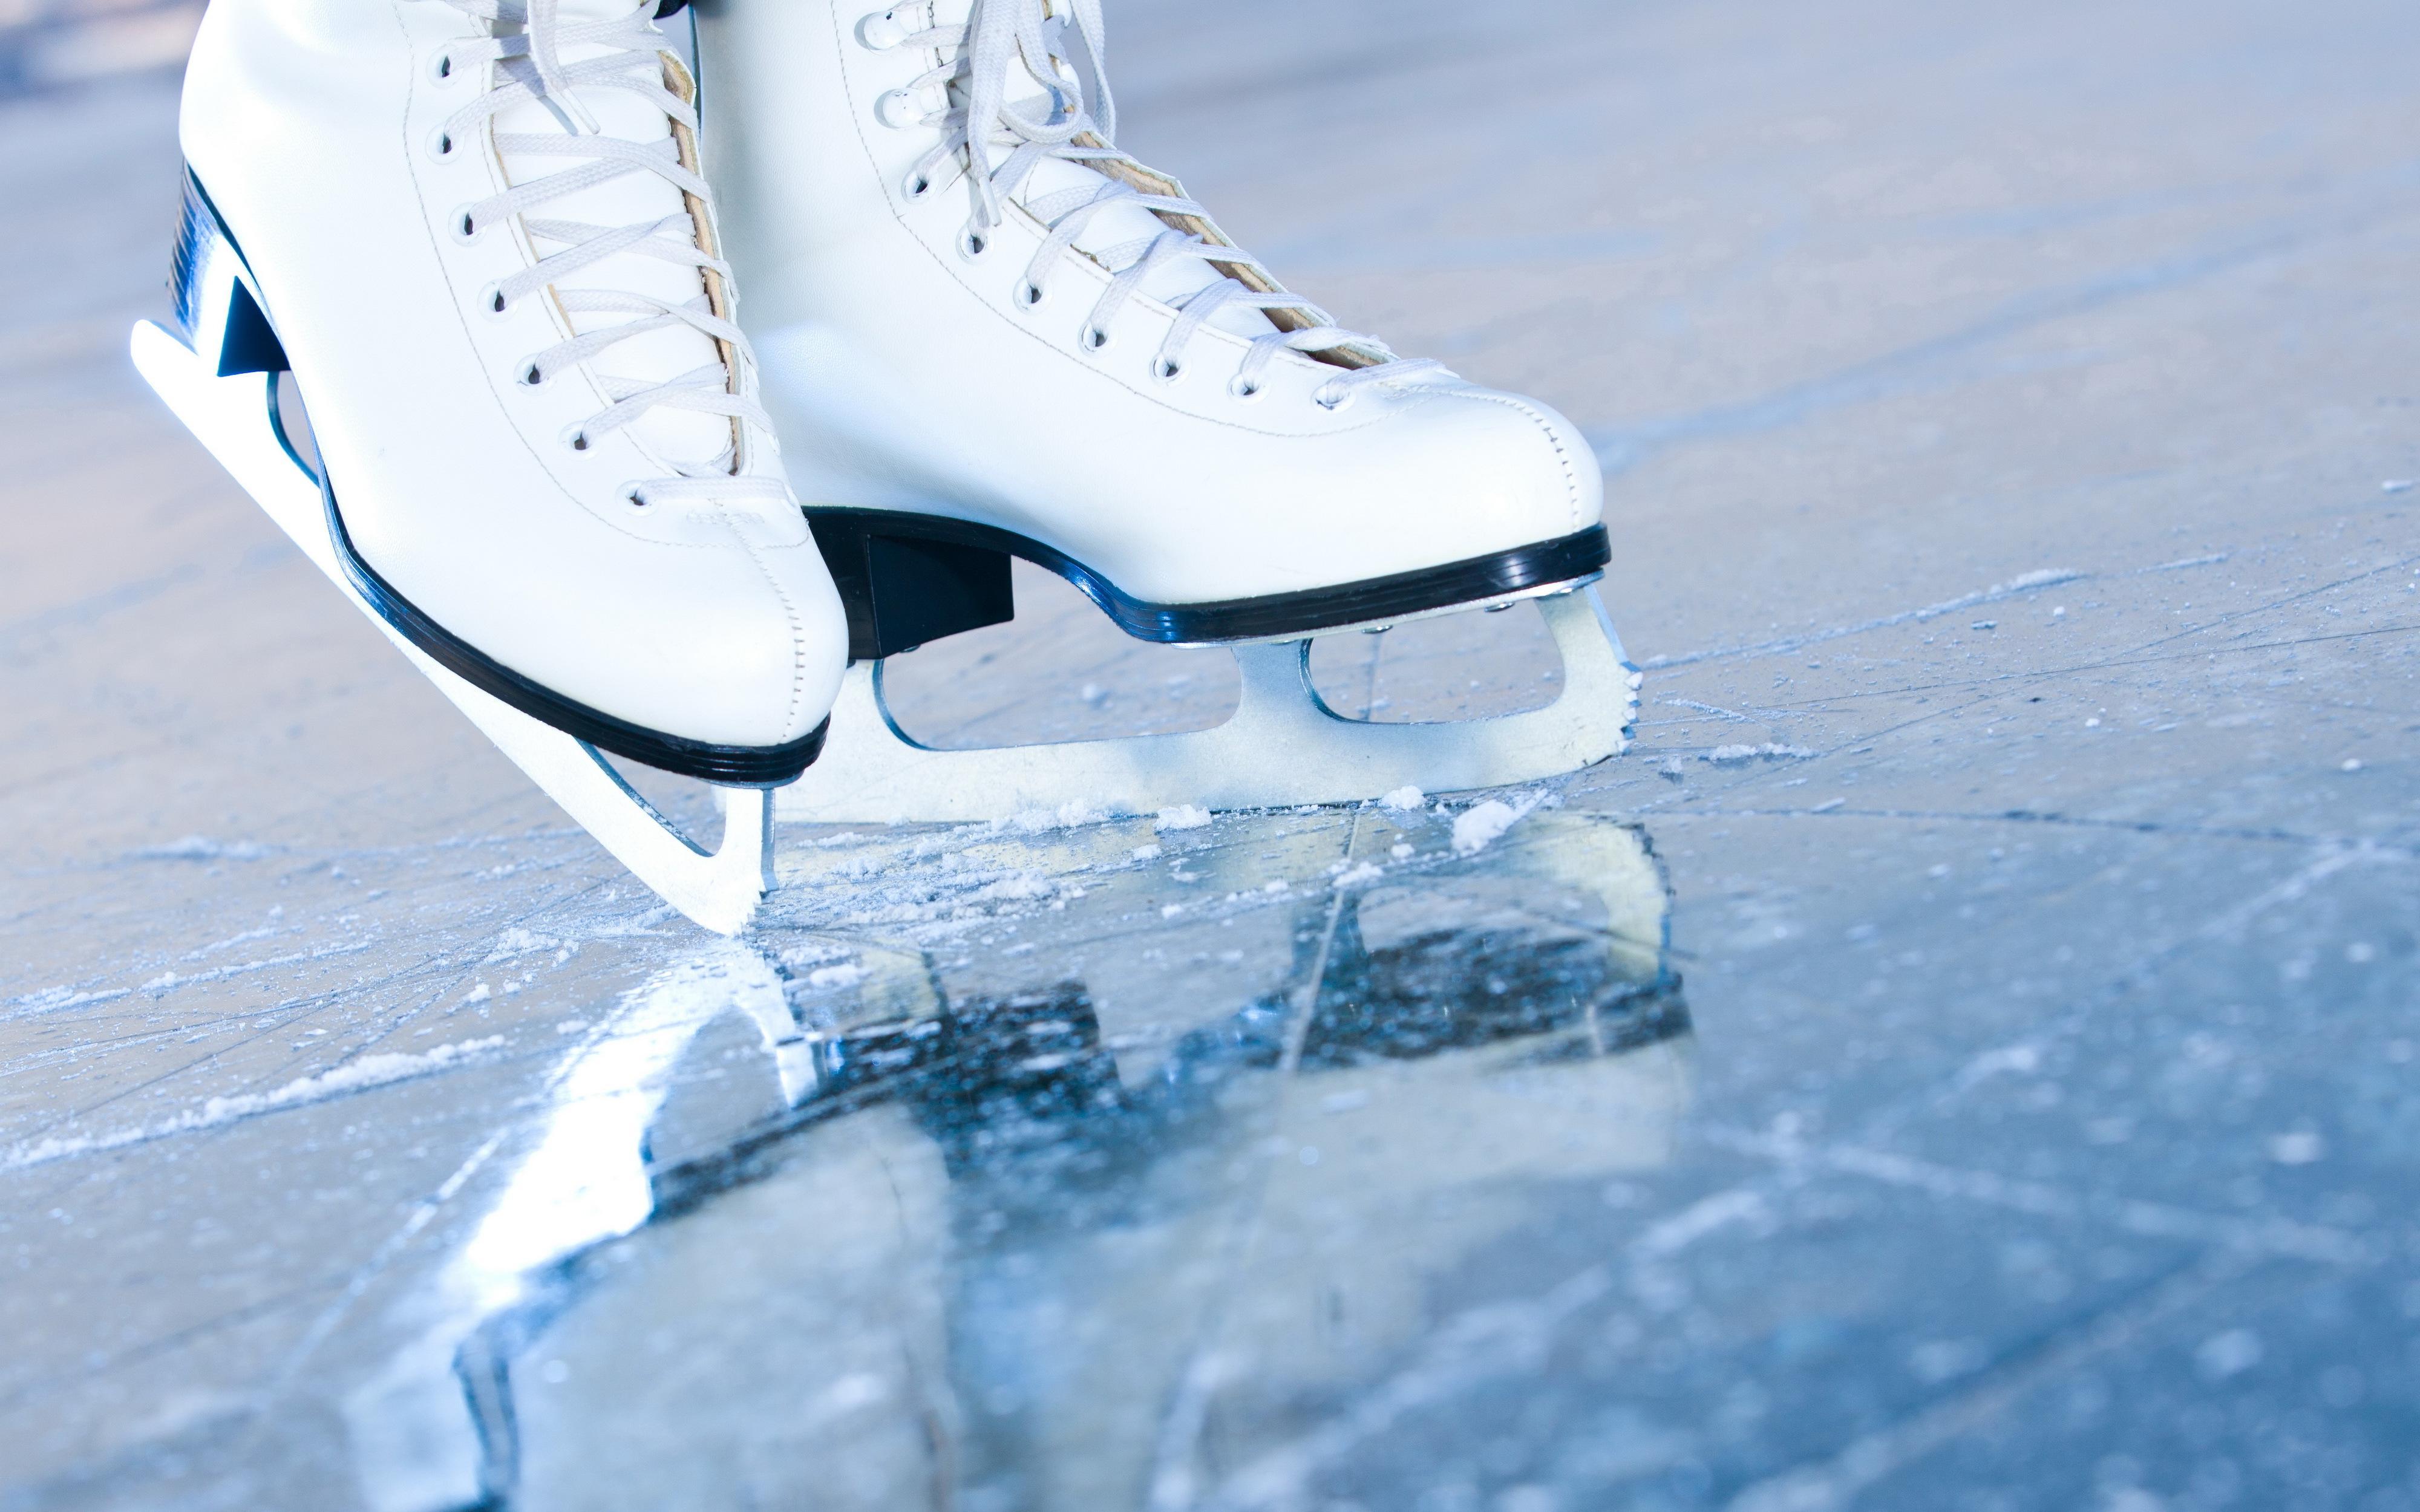 Ice rink clipart wallpaper jpg royalty free download ice skating wallpaper jpg royalty free download